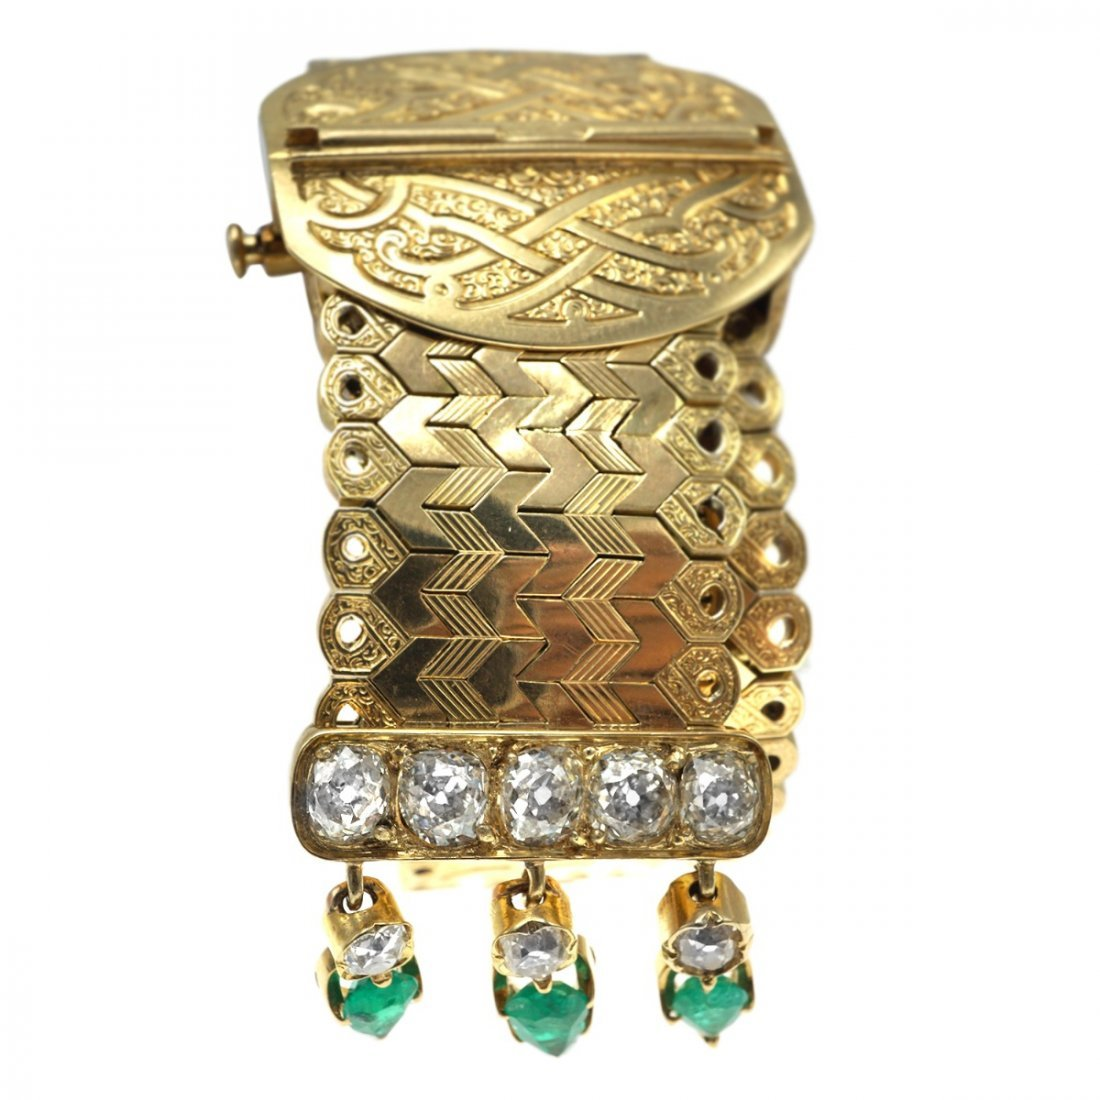 FRENCH EMERALD DIAMOND 18 KARAT GOLD BRACELET - 2